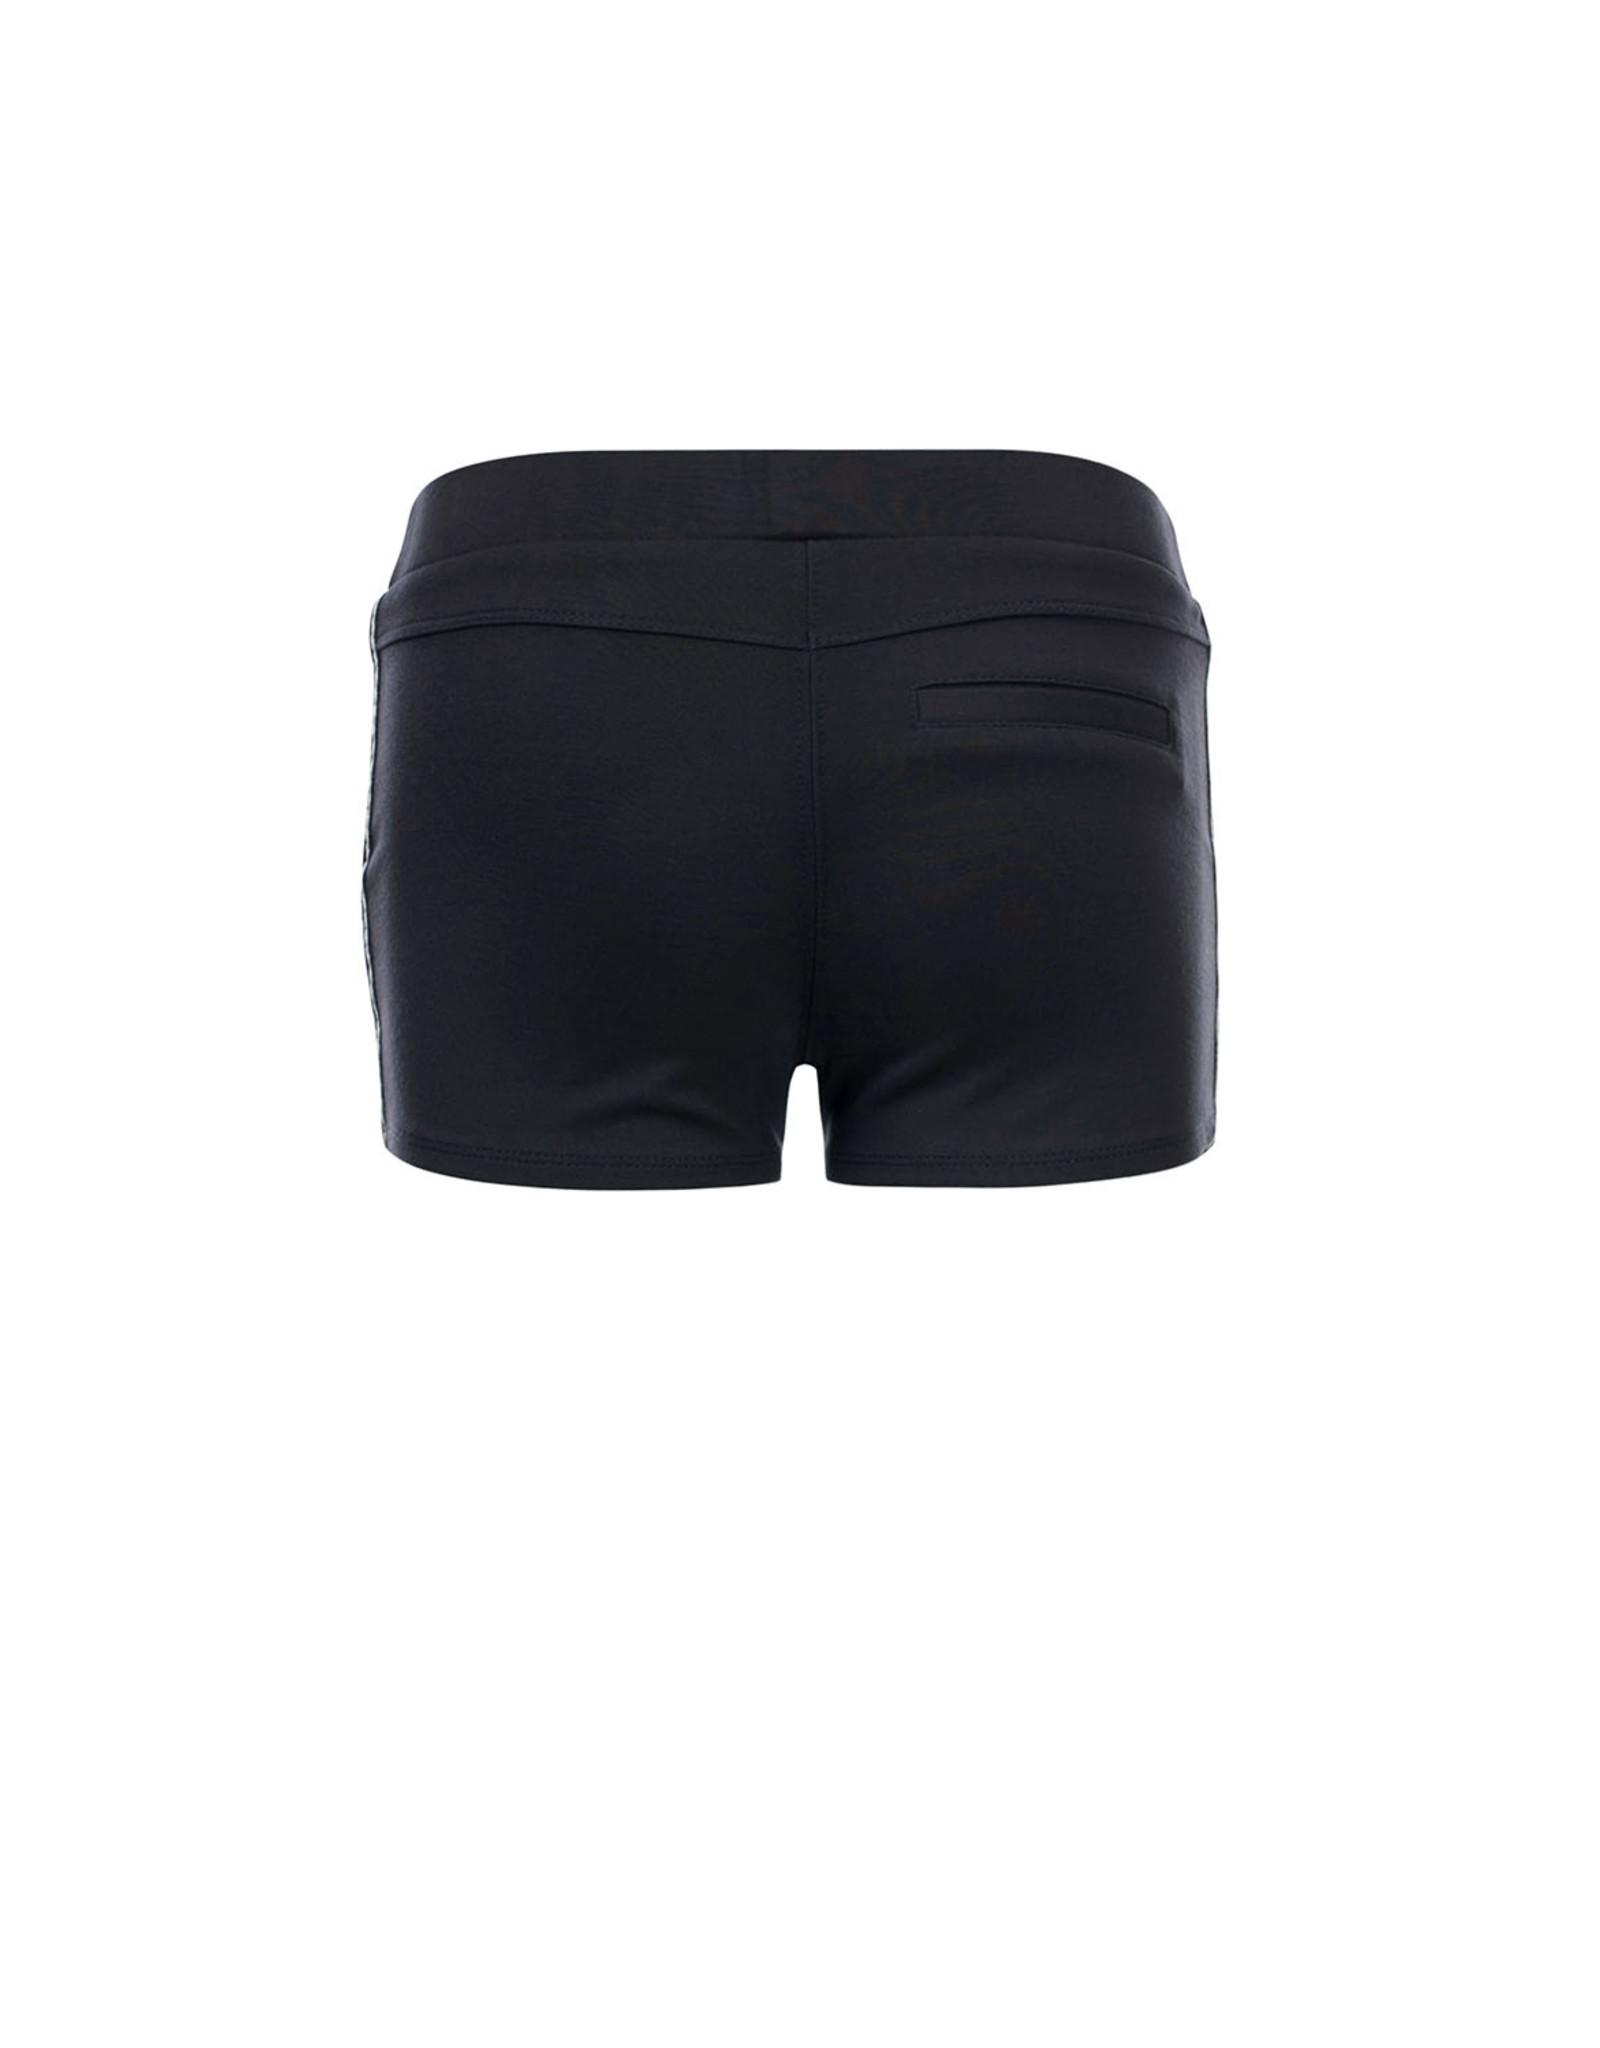 Looxs 10Sixteen Interlock shorts raven